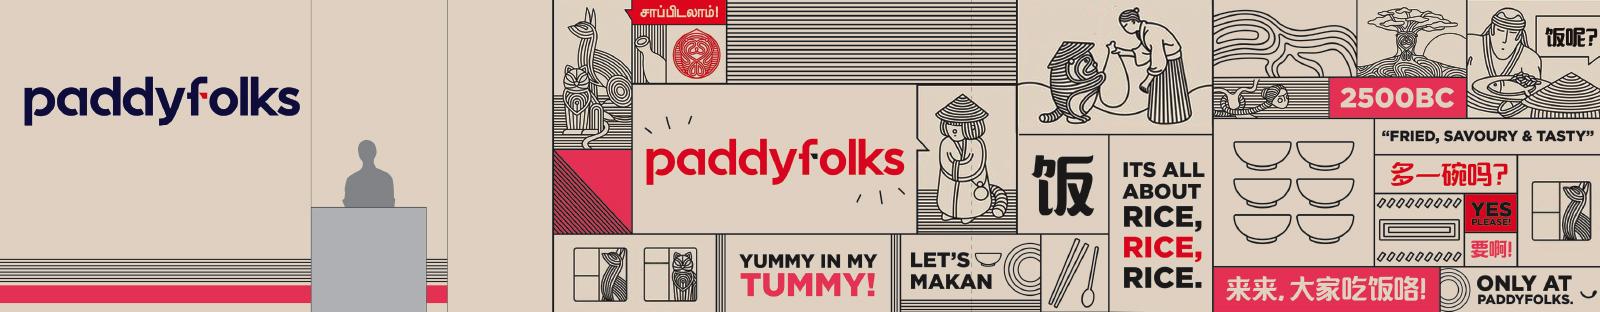 paddyfolks-banner-proposal-4.jpg